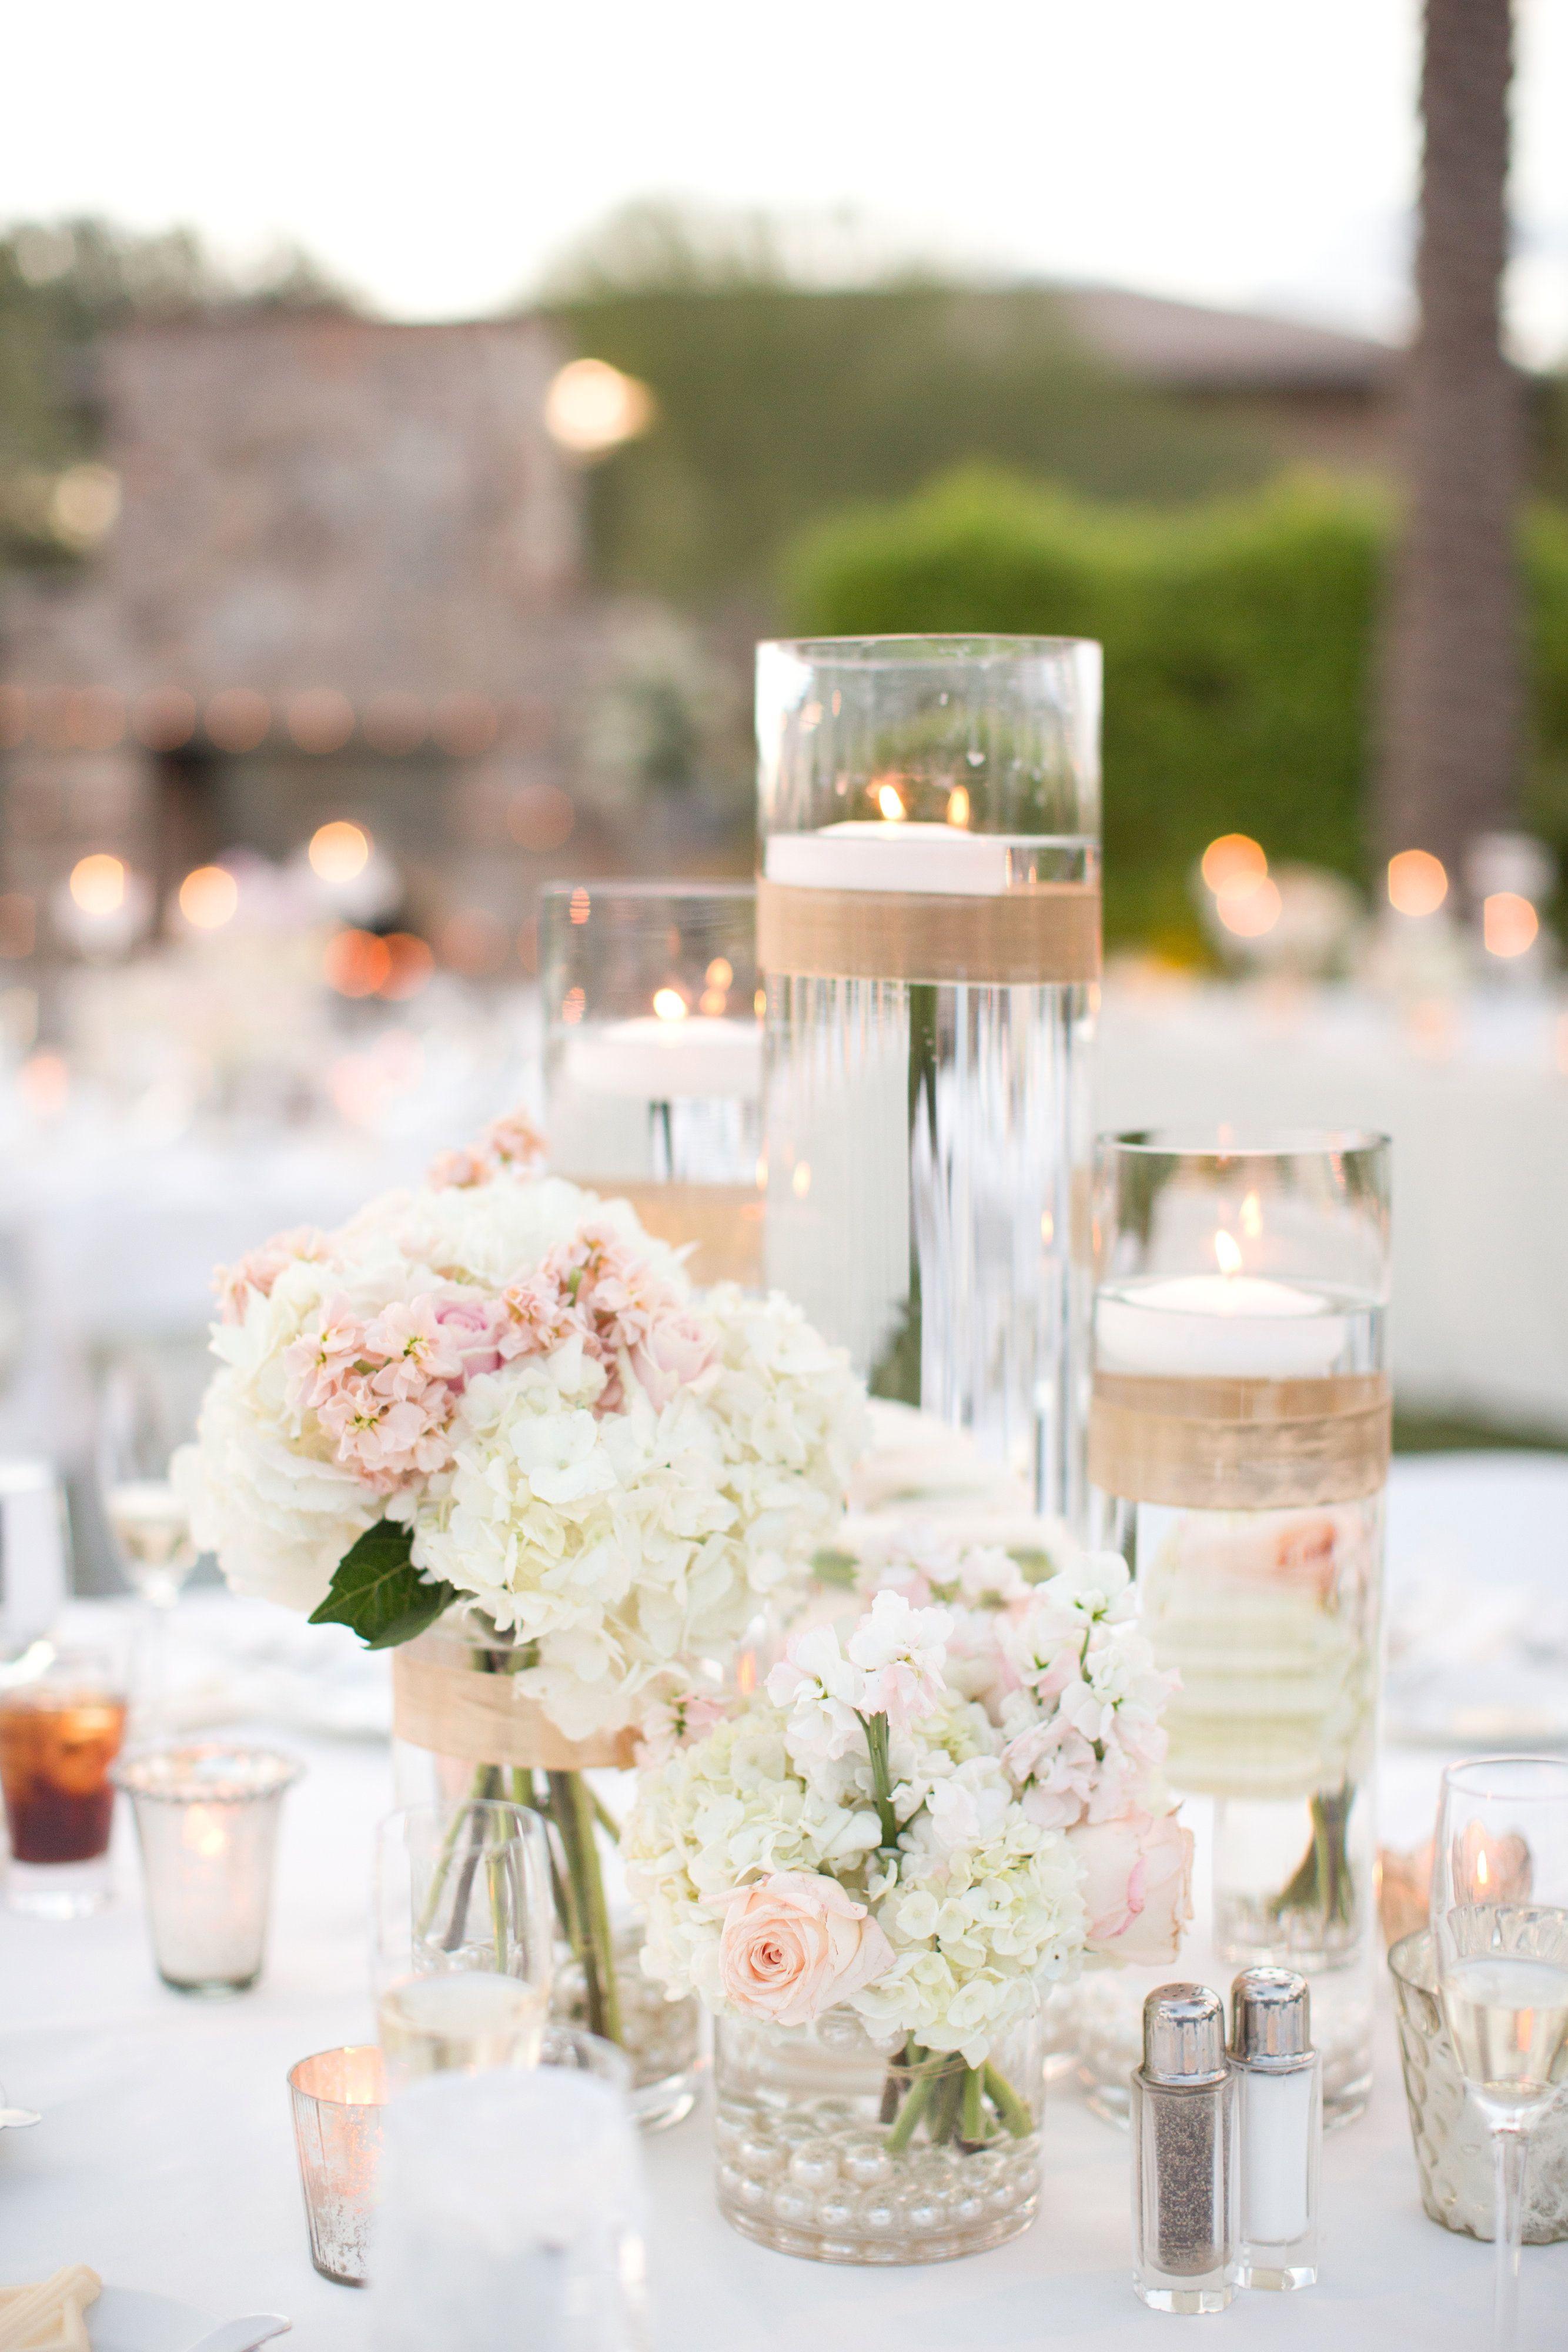 Table spring wedding tablescapes - Alyssa Nick Blush Wedding Centerpiecesblush